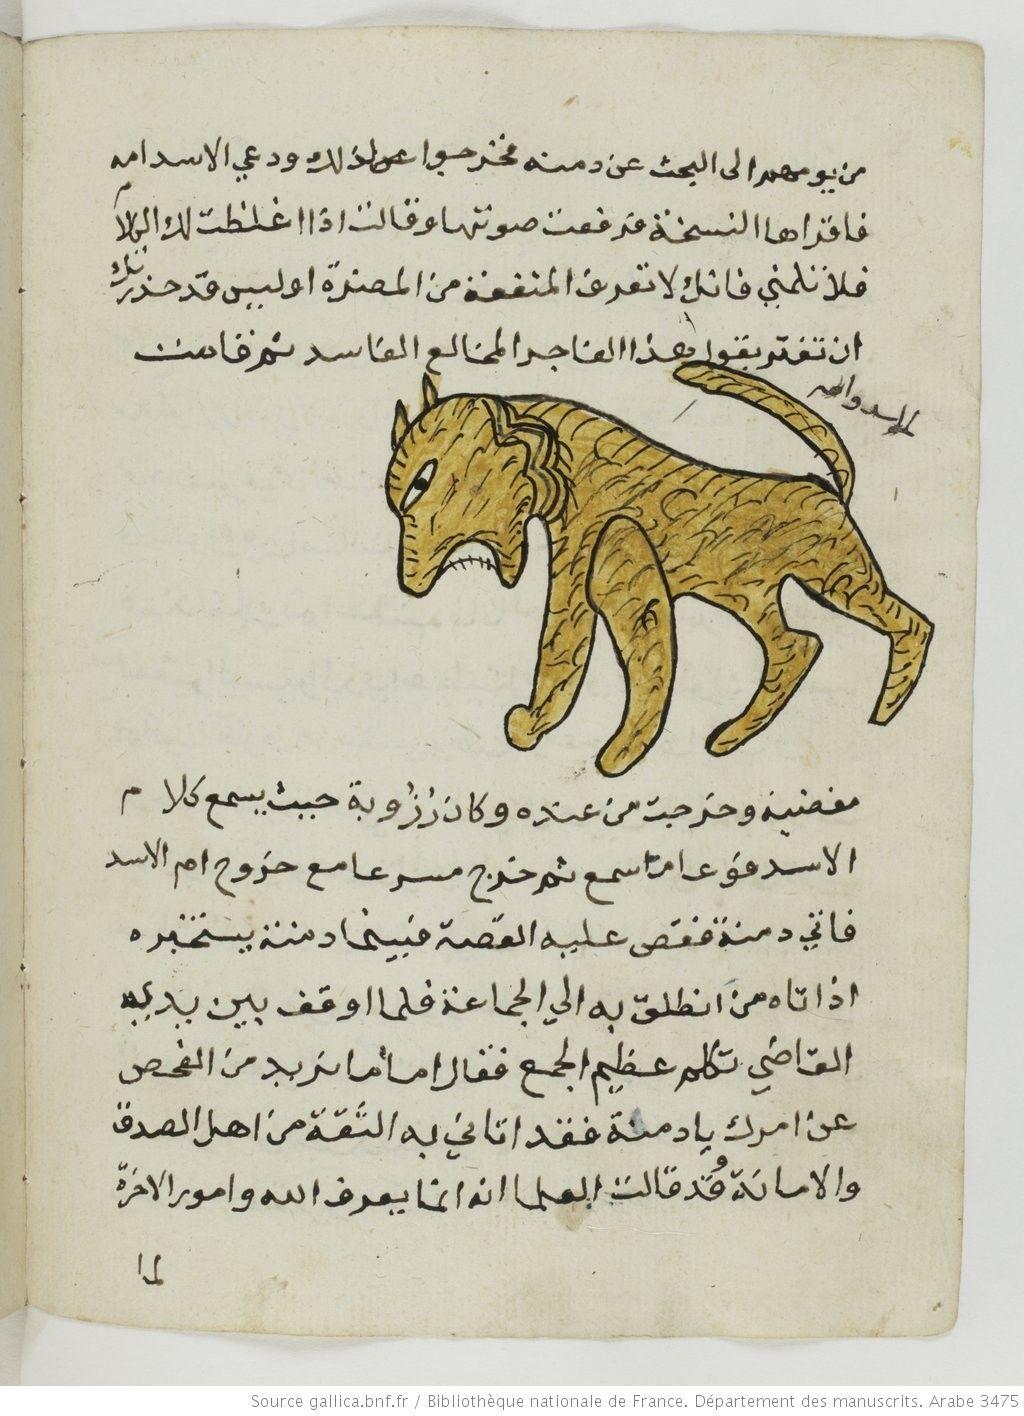 Kalila Wa Dimna Traduit Par Ibn Al Muqaffa ʿabd Allah 0720 0756 عبد الله بن المقفع 1762 Universite Paris Sorbonne Bibliotheque Nationale De France Allah